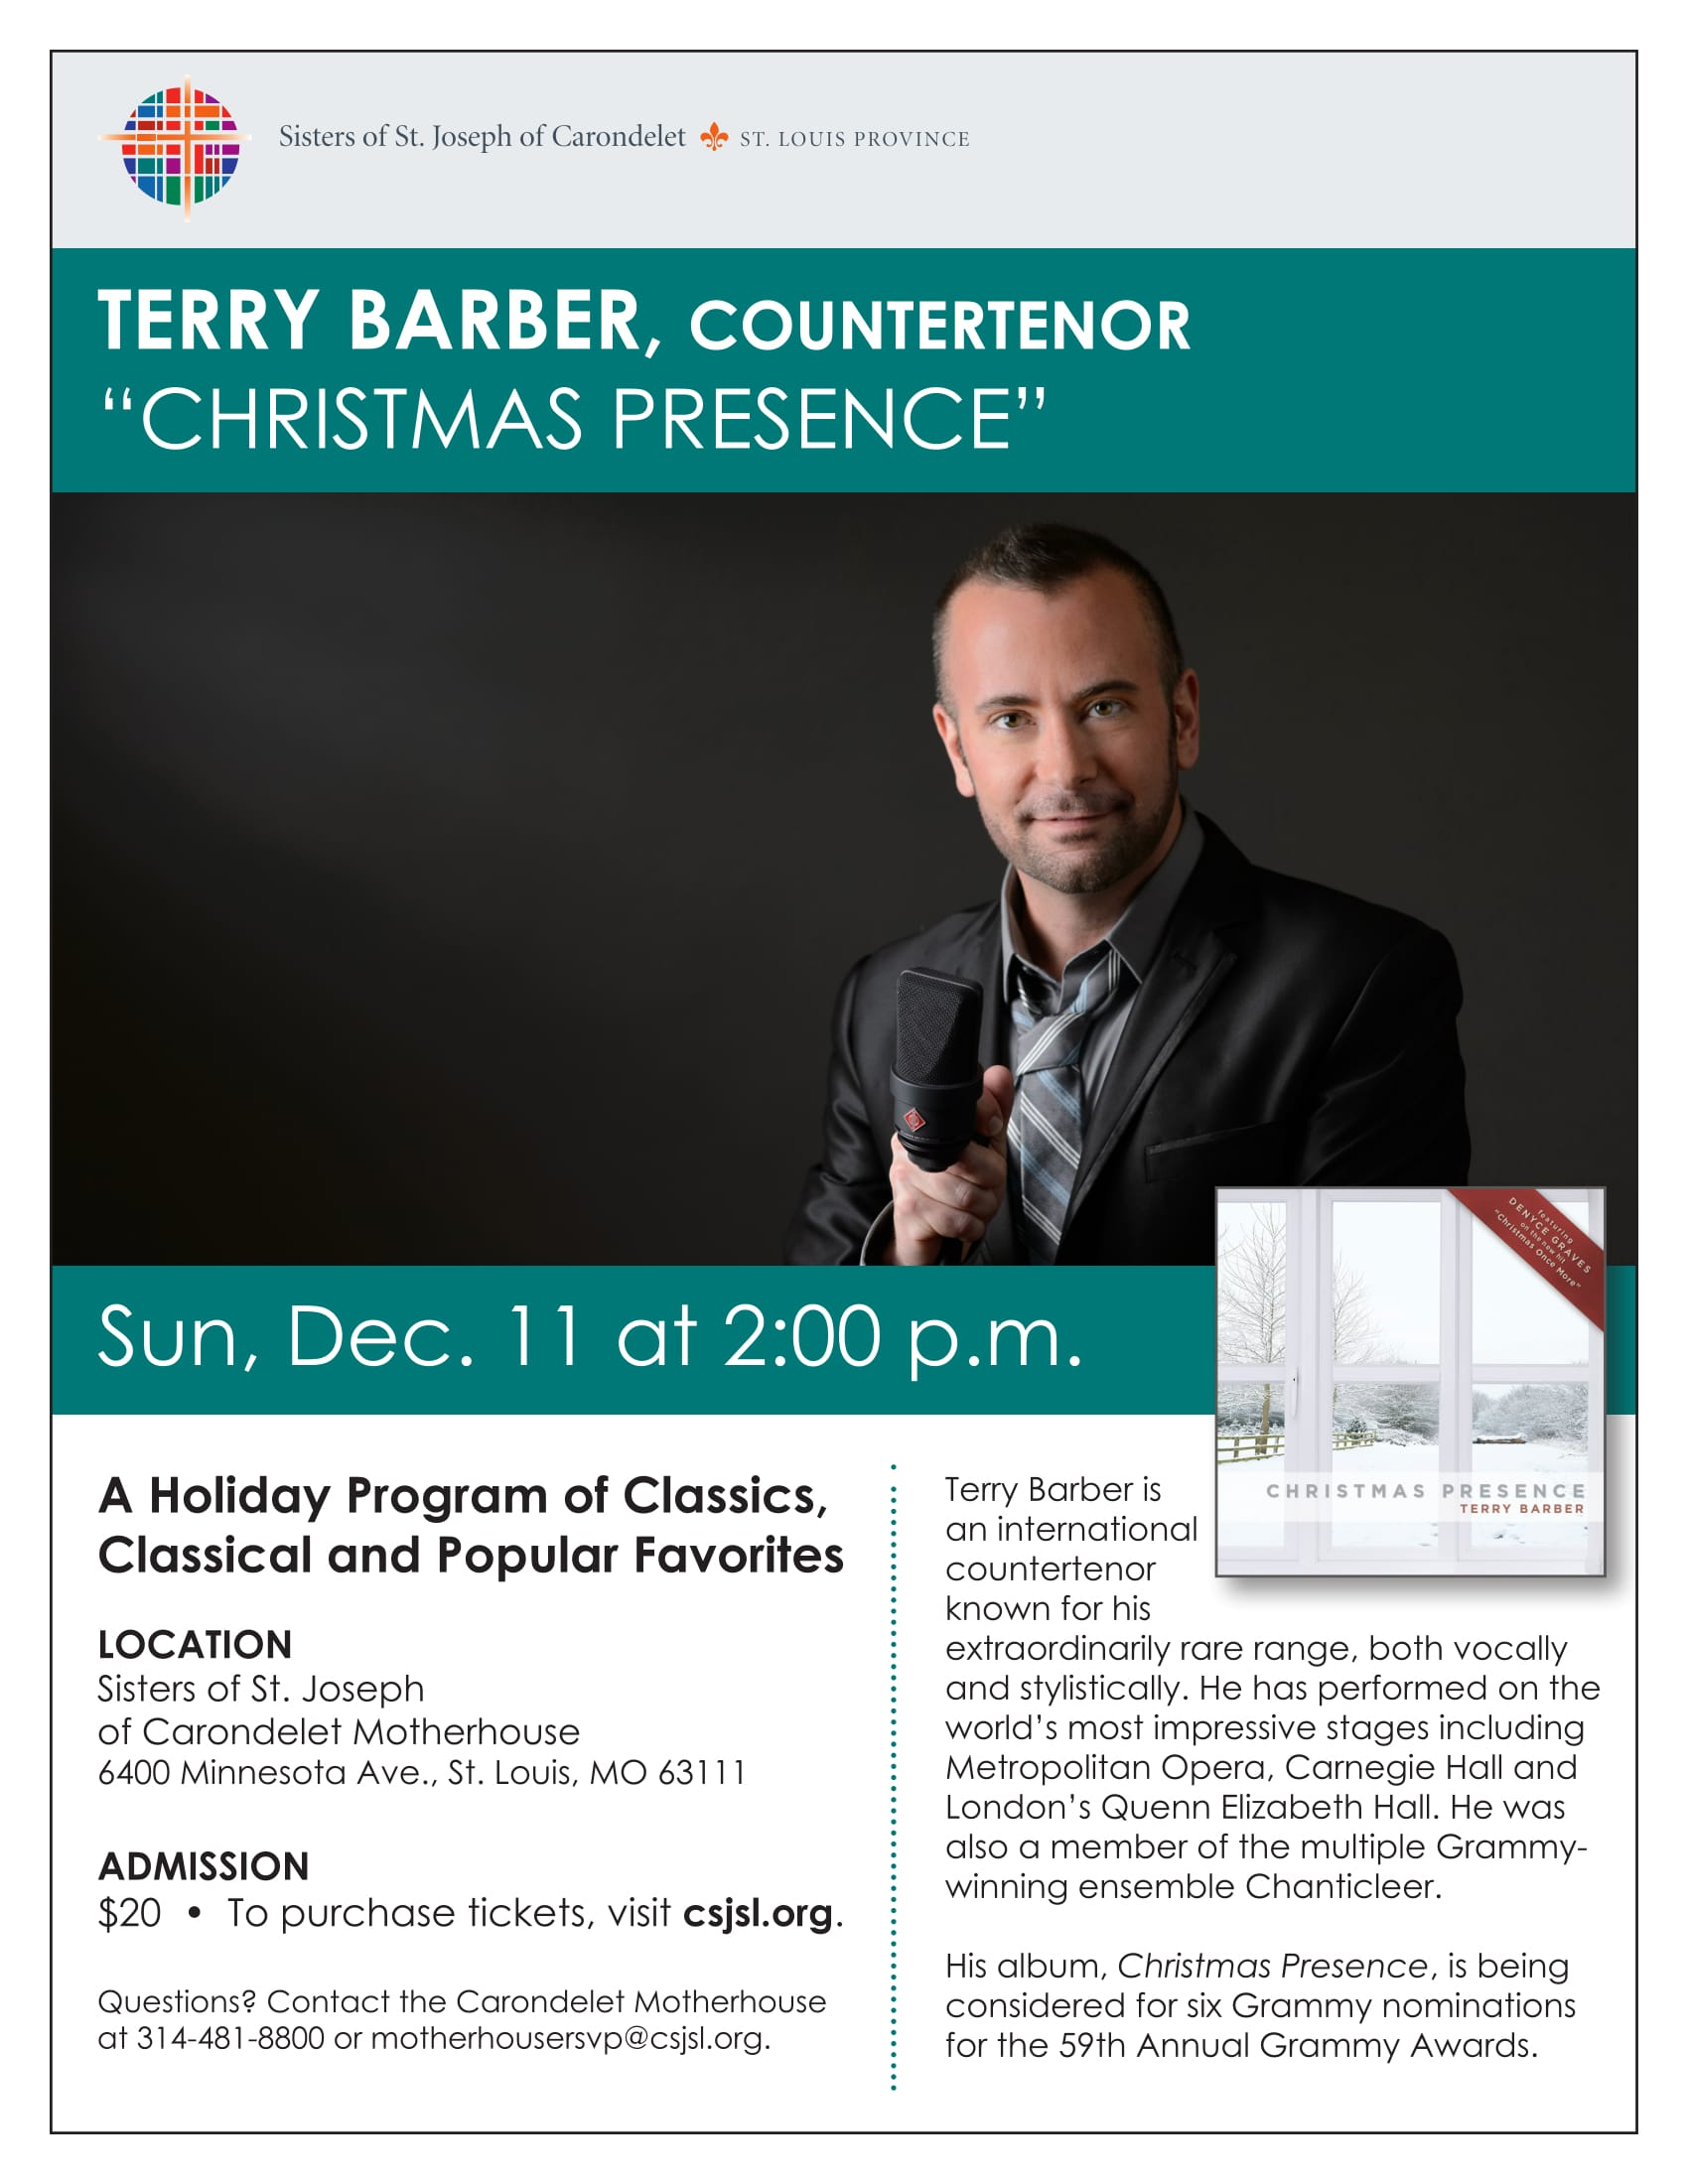 terry-barber-concert-flyer-1